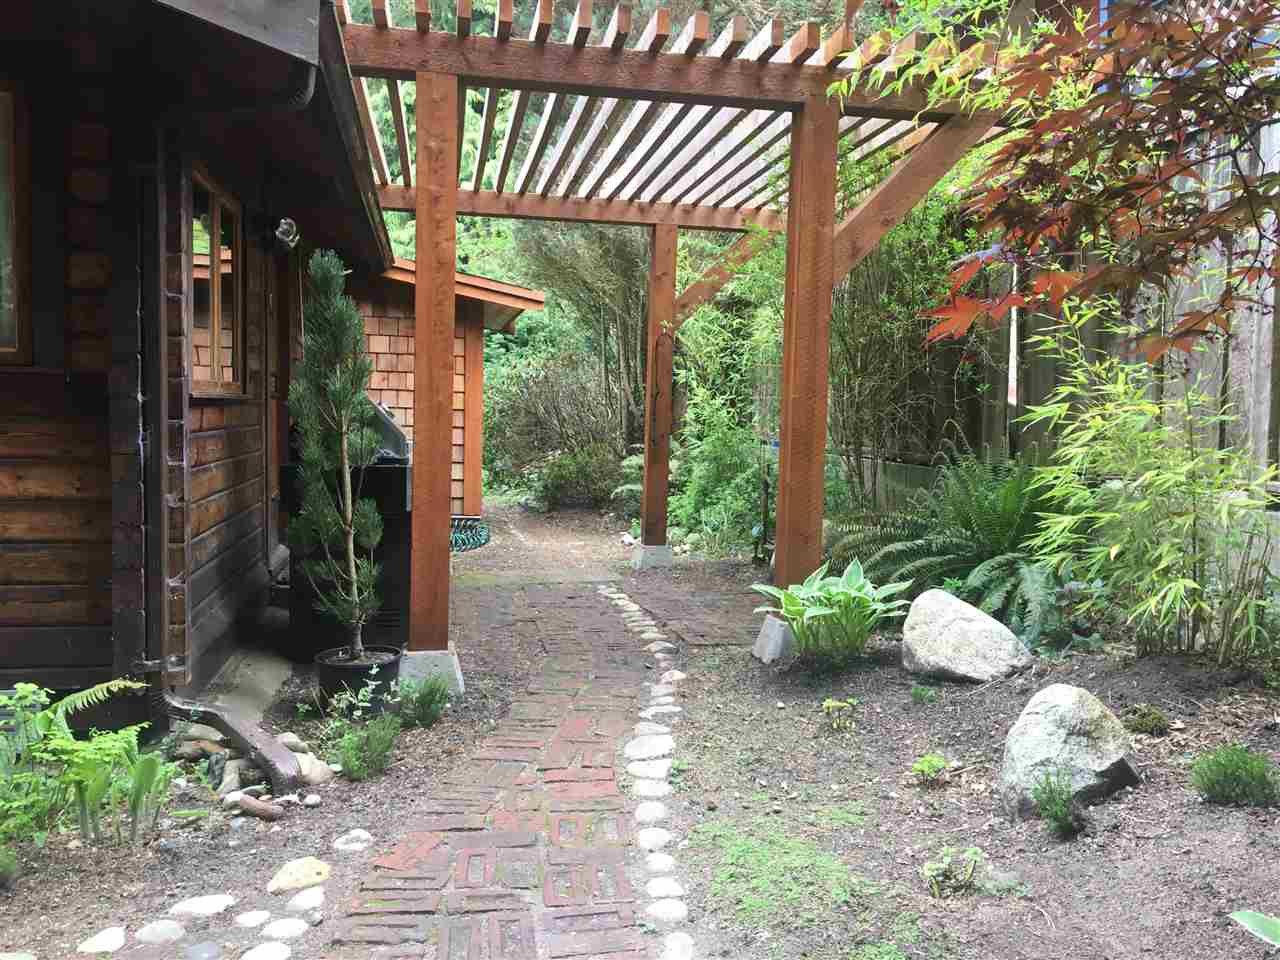 Main Photo: 1001 METCALFE Road: Roberts Creek House for sale (Sunshine Coast)  : MLS®# R2265506